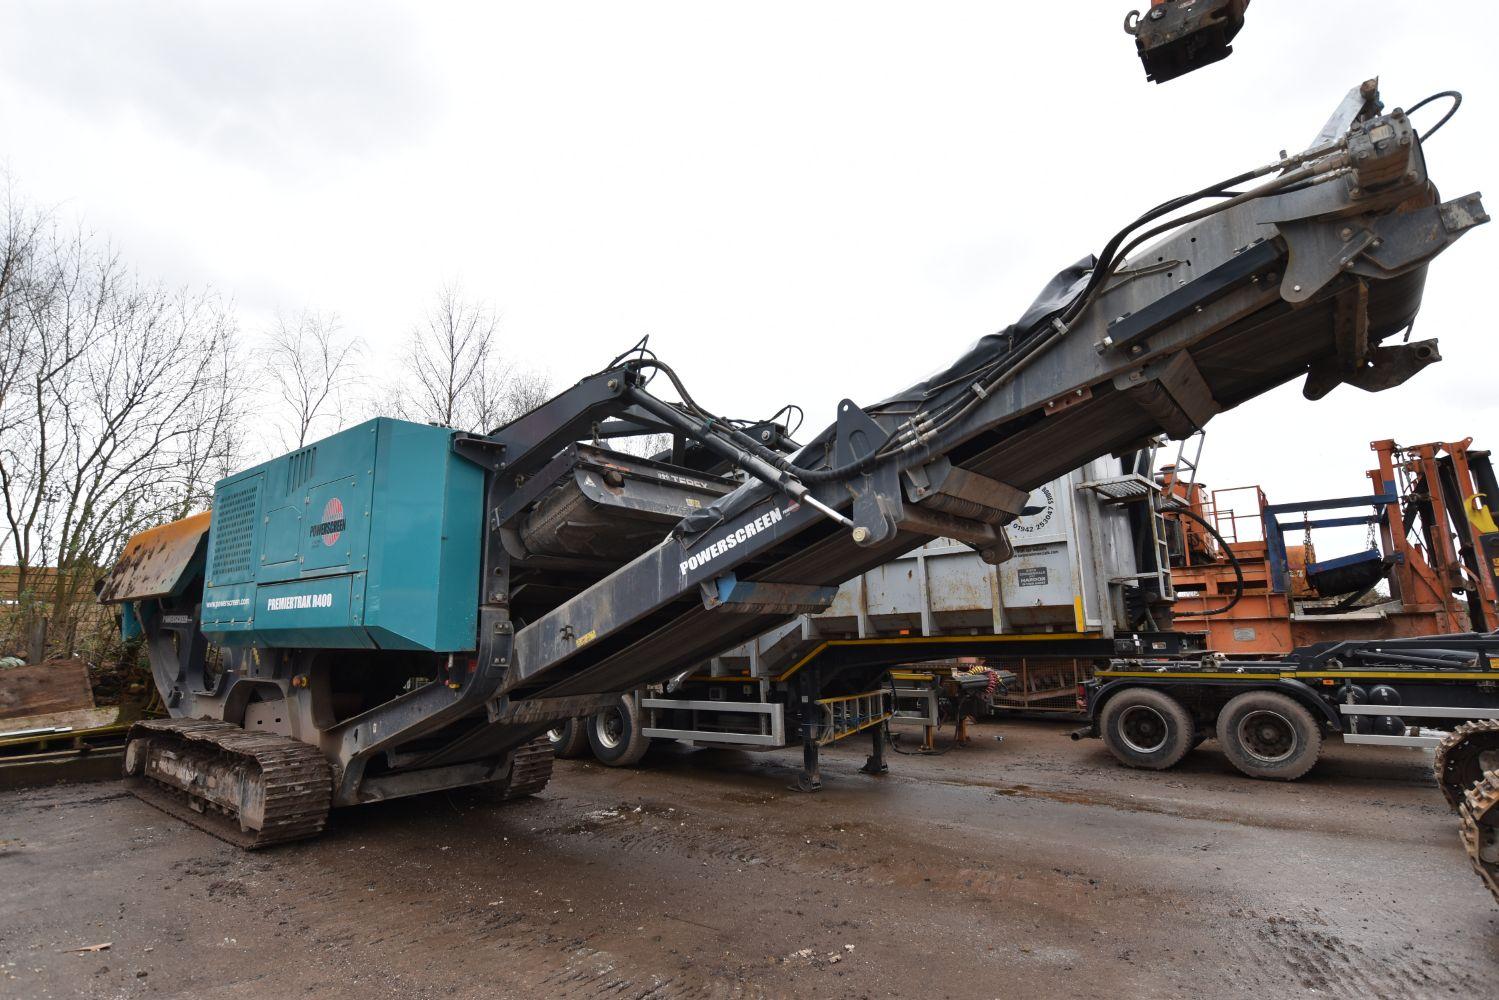 Major Sale of Demolition & Construction Contractors Plant & Equipment - approx. 600 lots (5% Buyers Premium Applicable on Major Items)